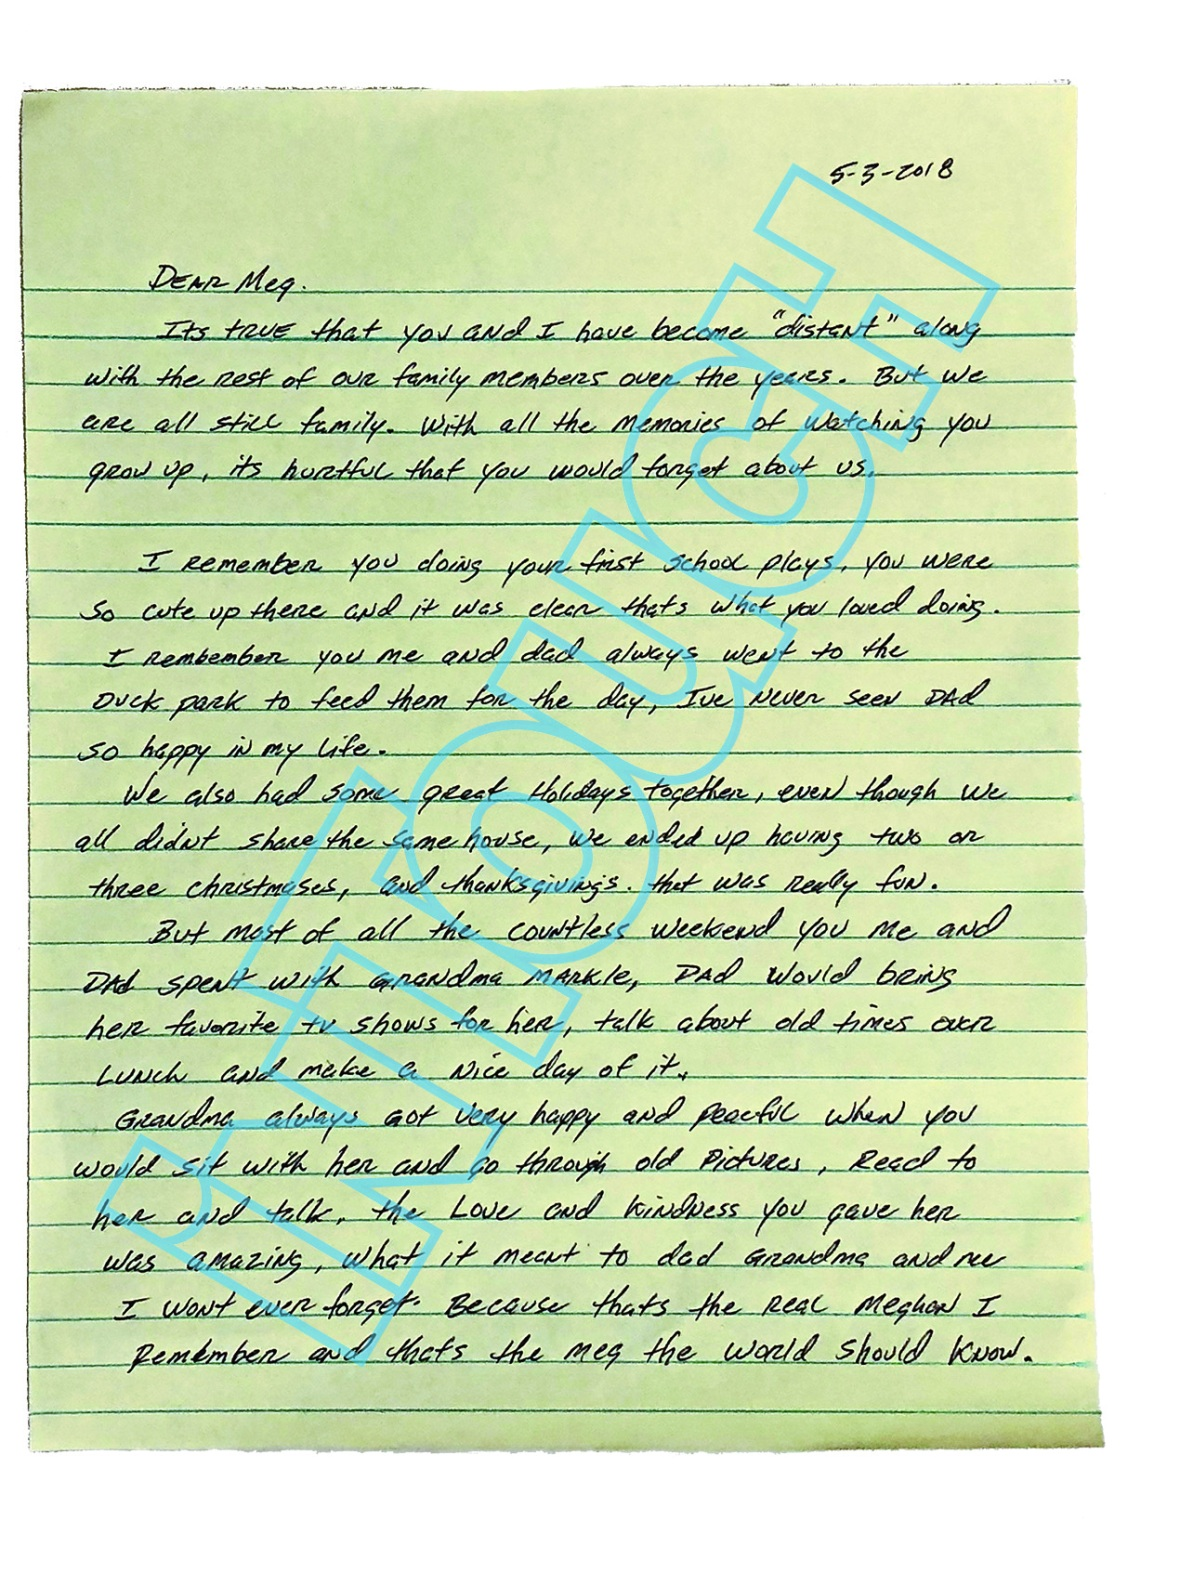 meghan markle brother letter